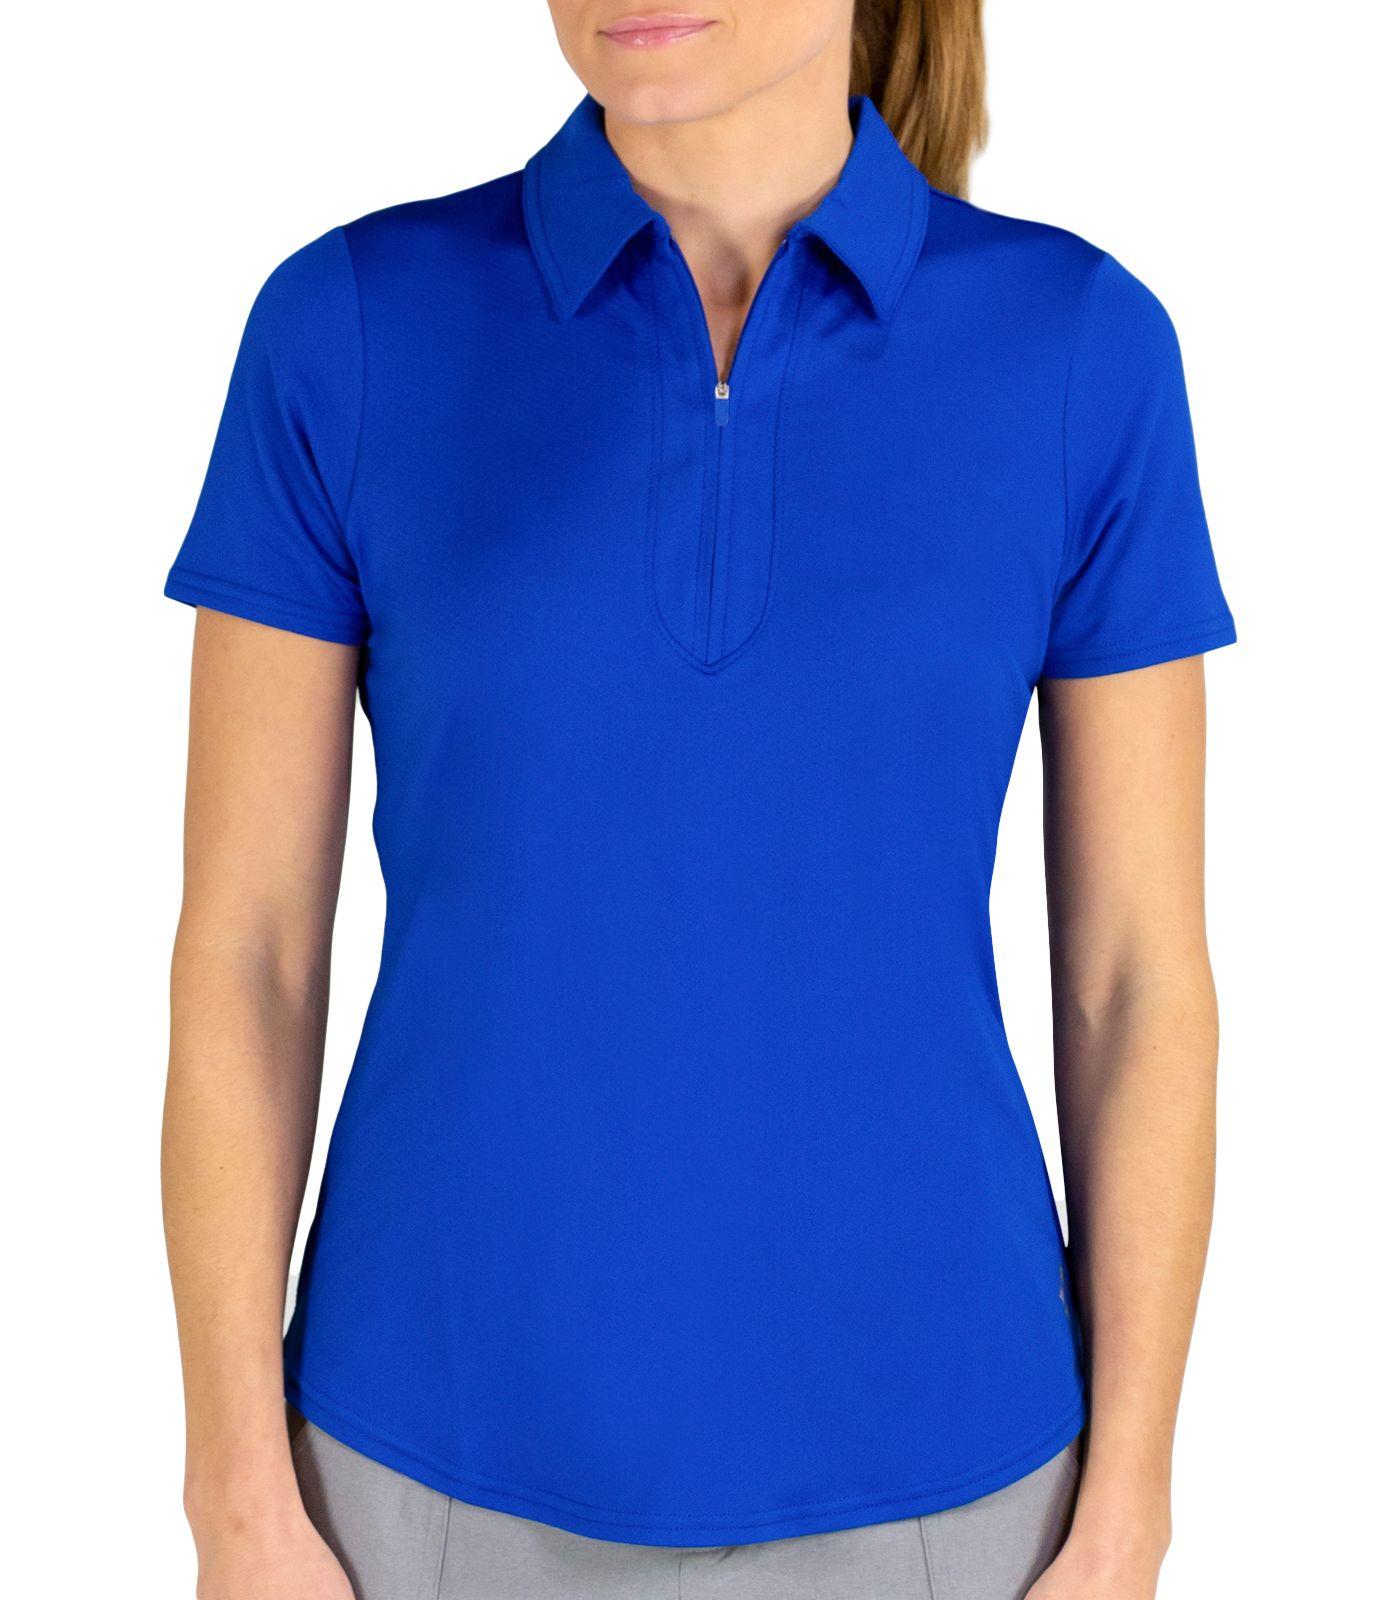 Jofit Women's Performance Golf Polo